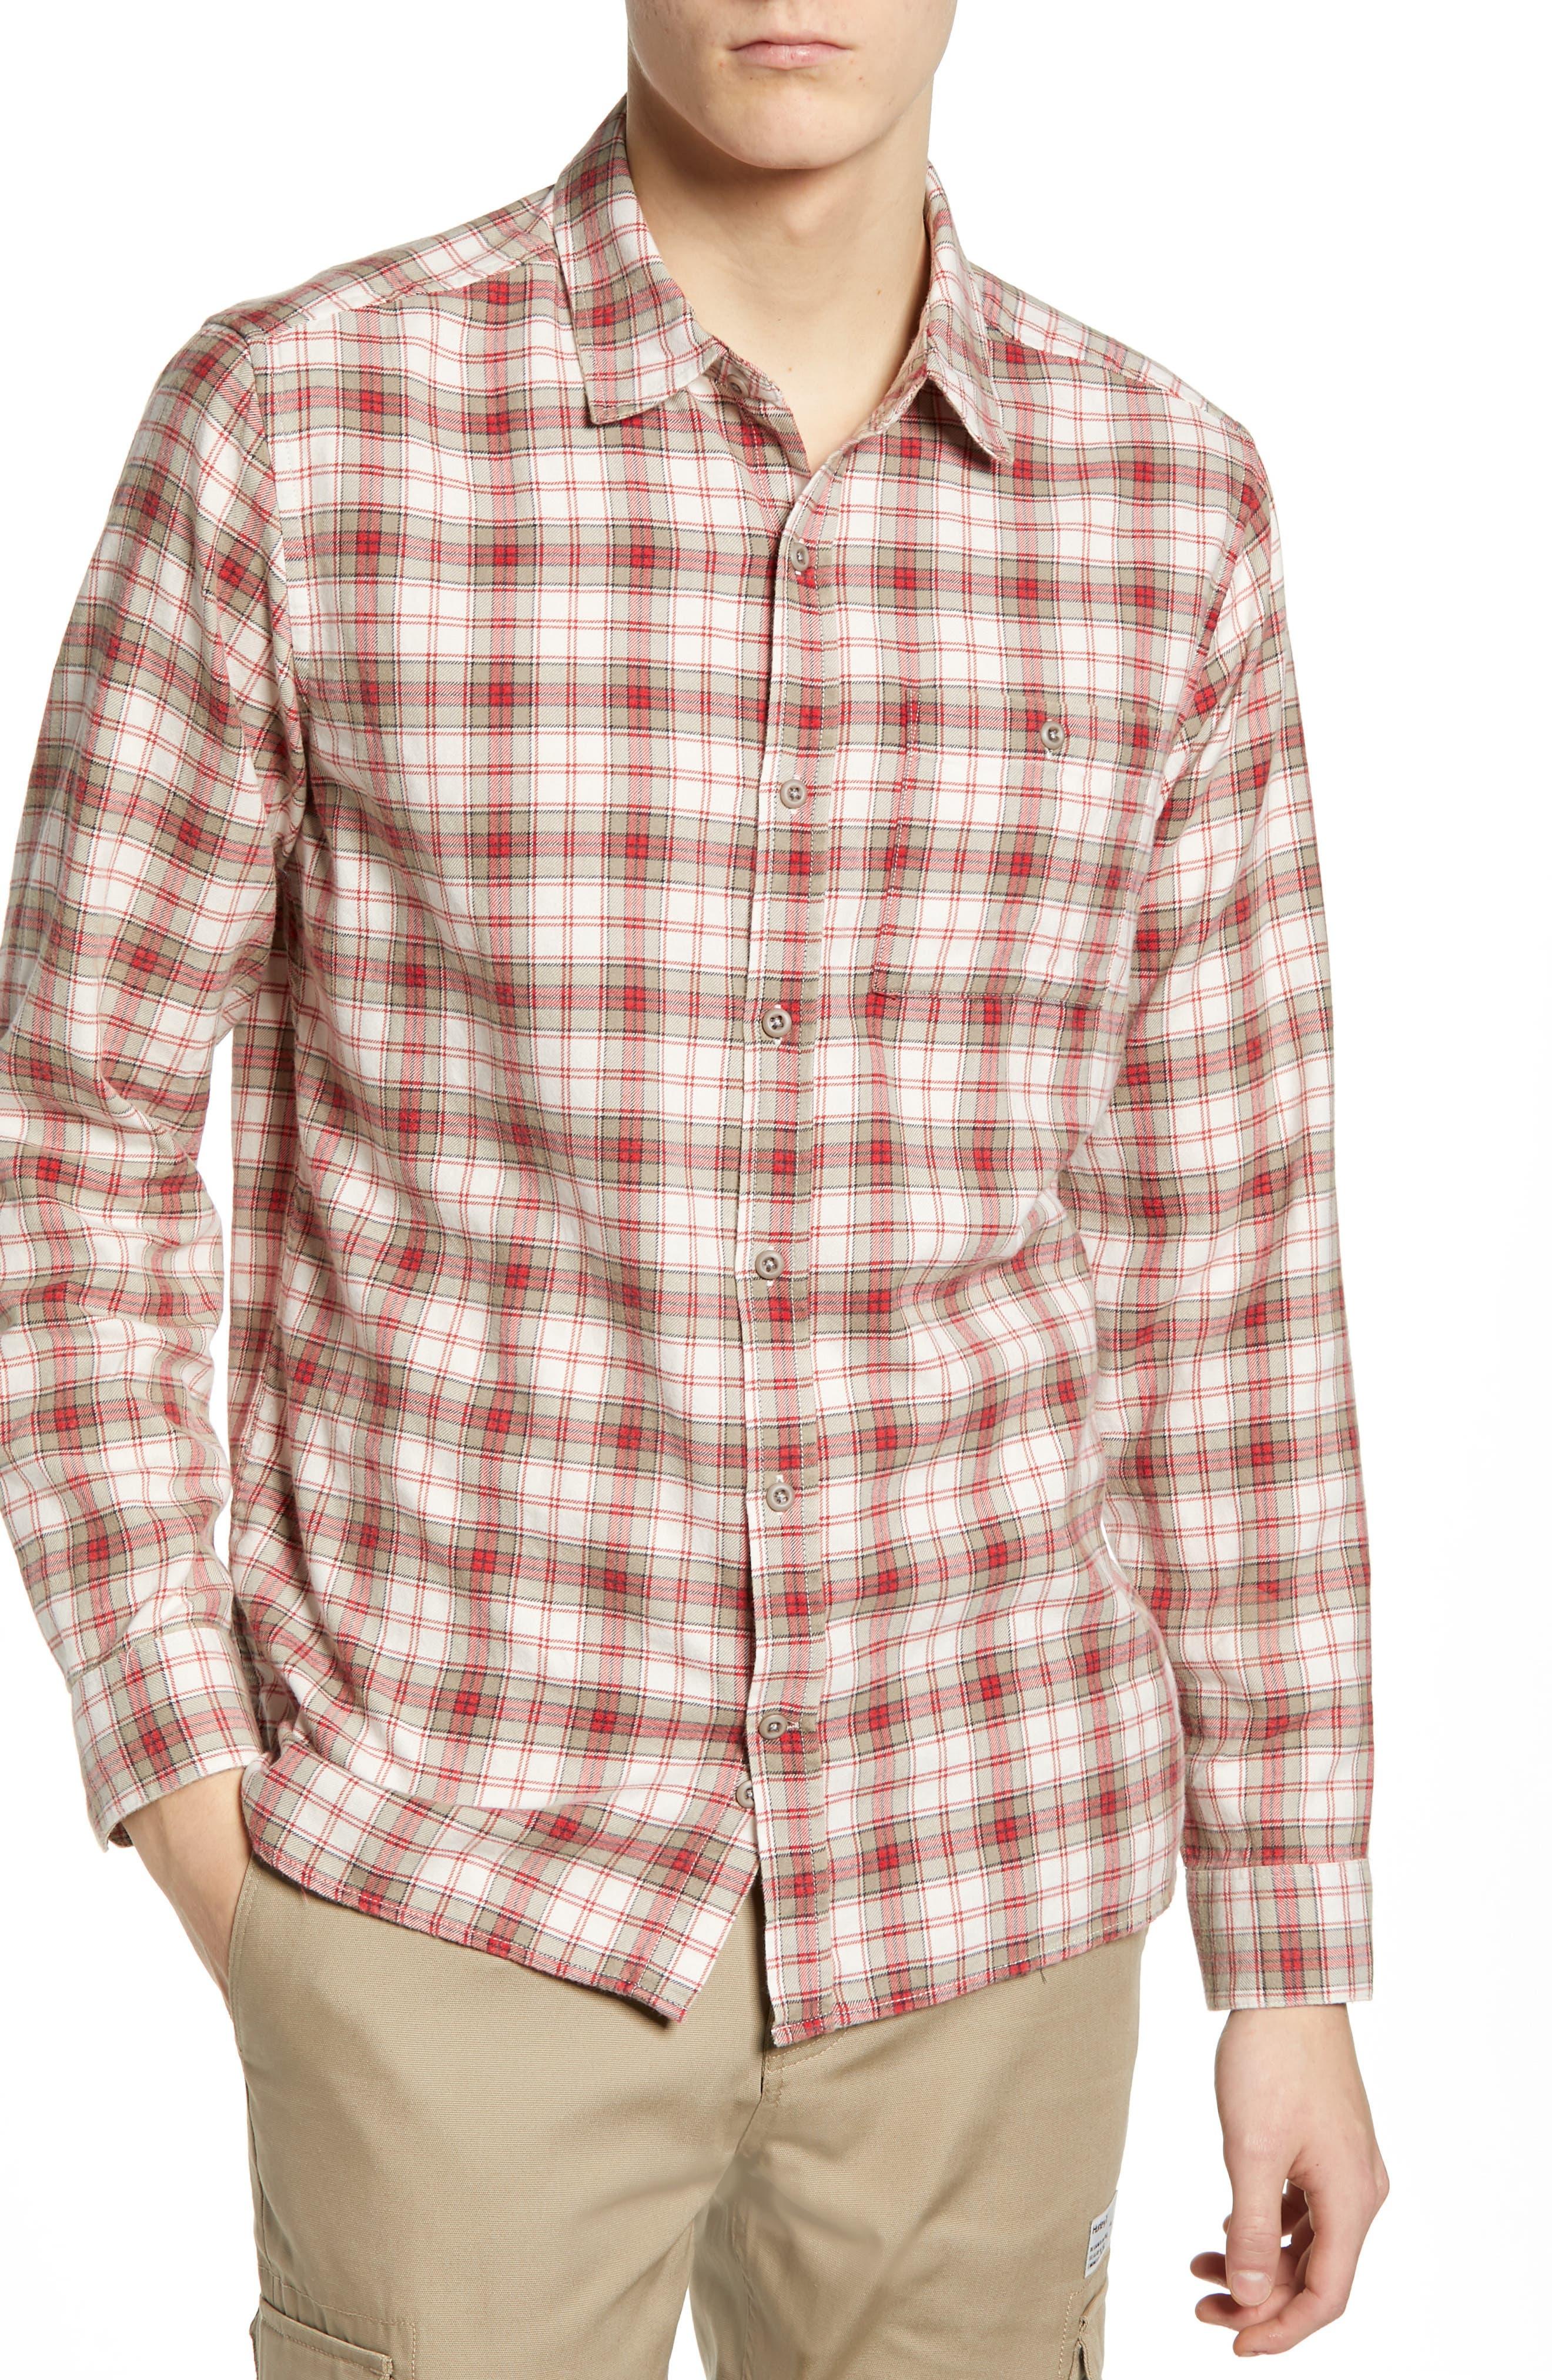 Hurley Ranger Plaid Cotton Flannel Sport Shirt, Red